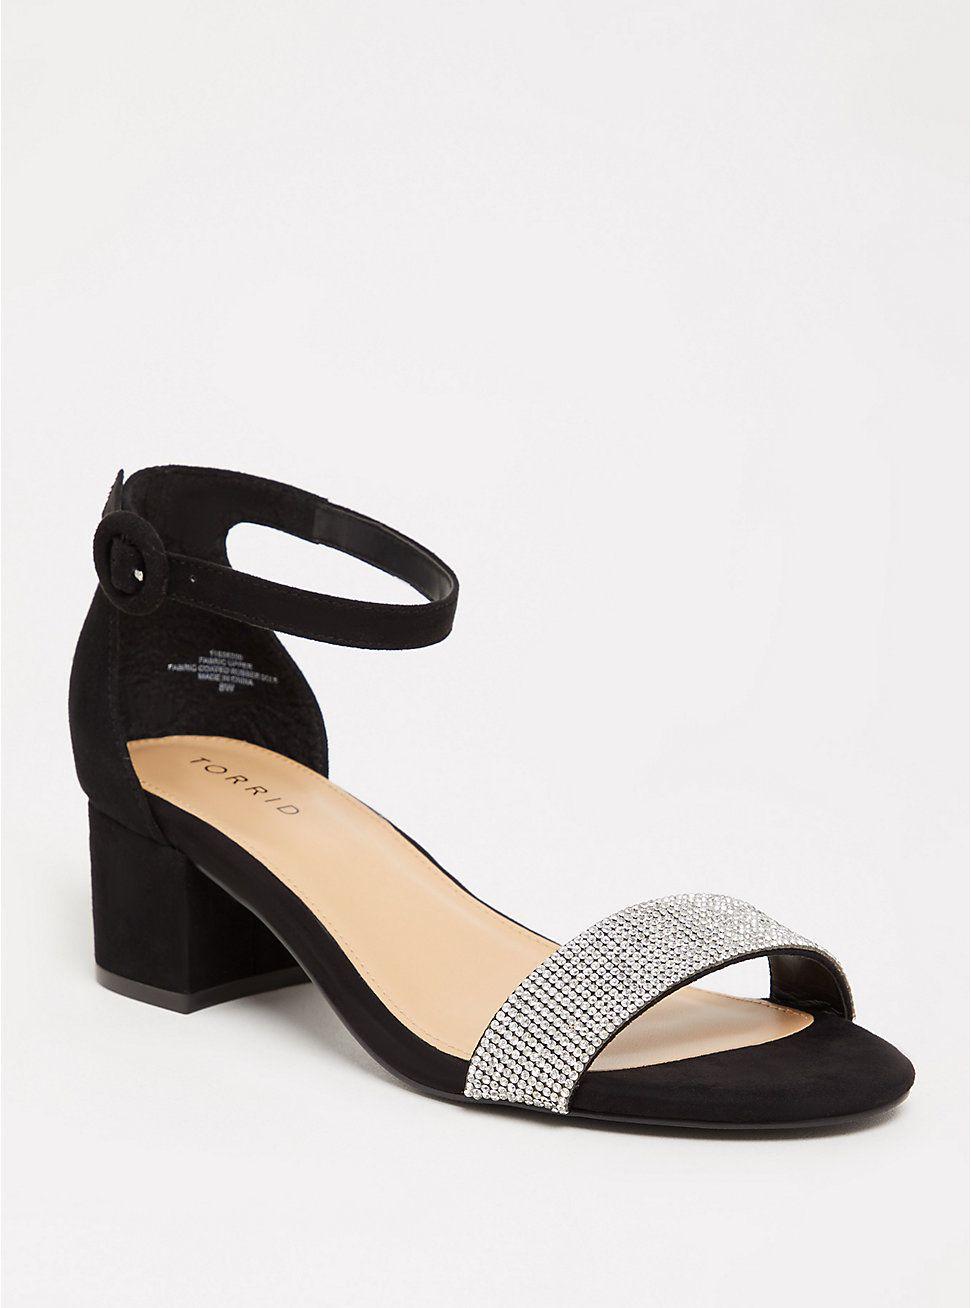 Black Rhinestone Block Heel Sandal Ww Black Ankle Strap Heels Block Heels Sandal Sandals Heels [ 1308 x 971 Pixel ]